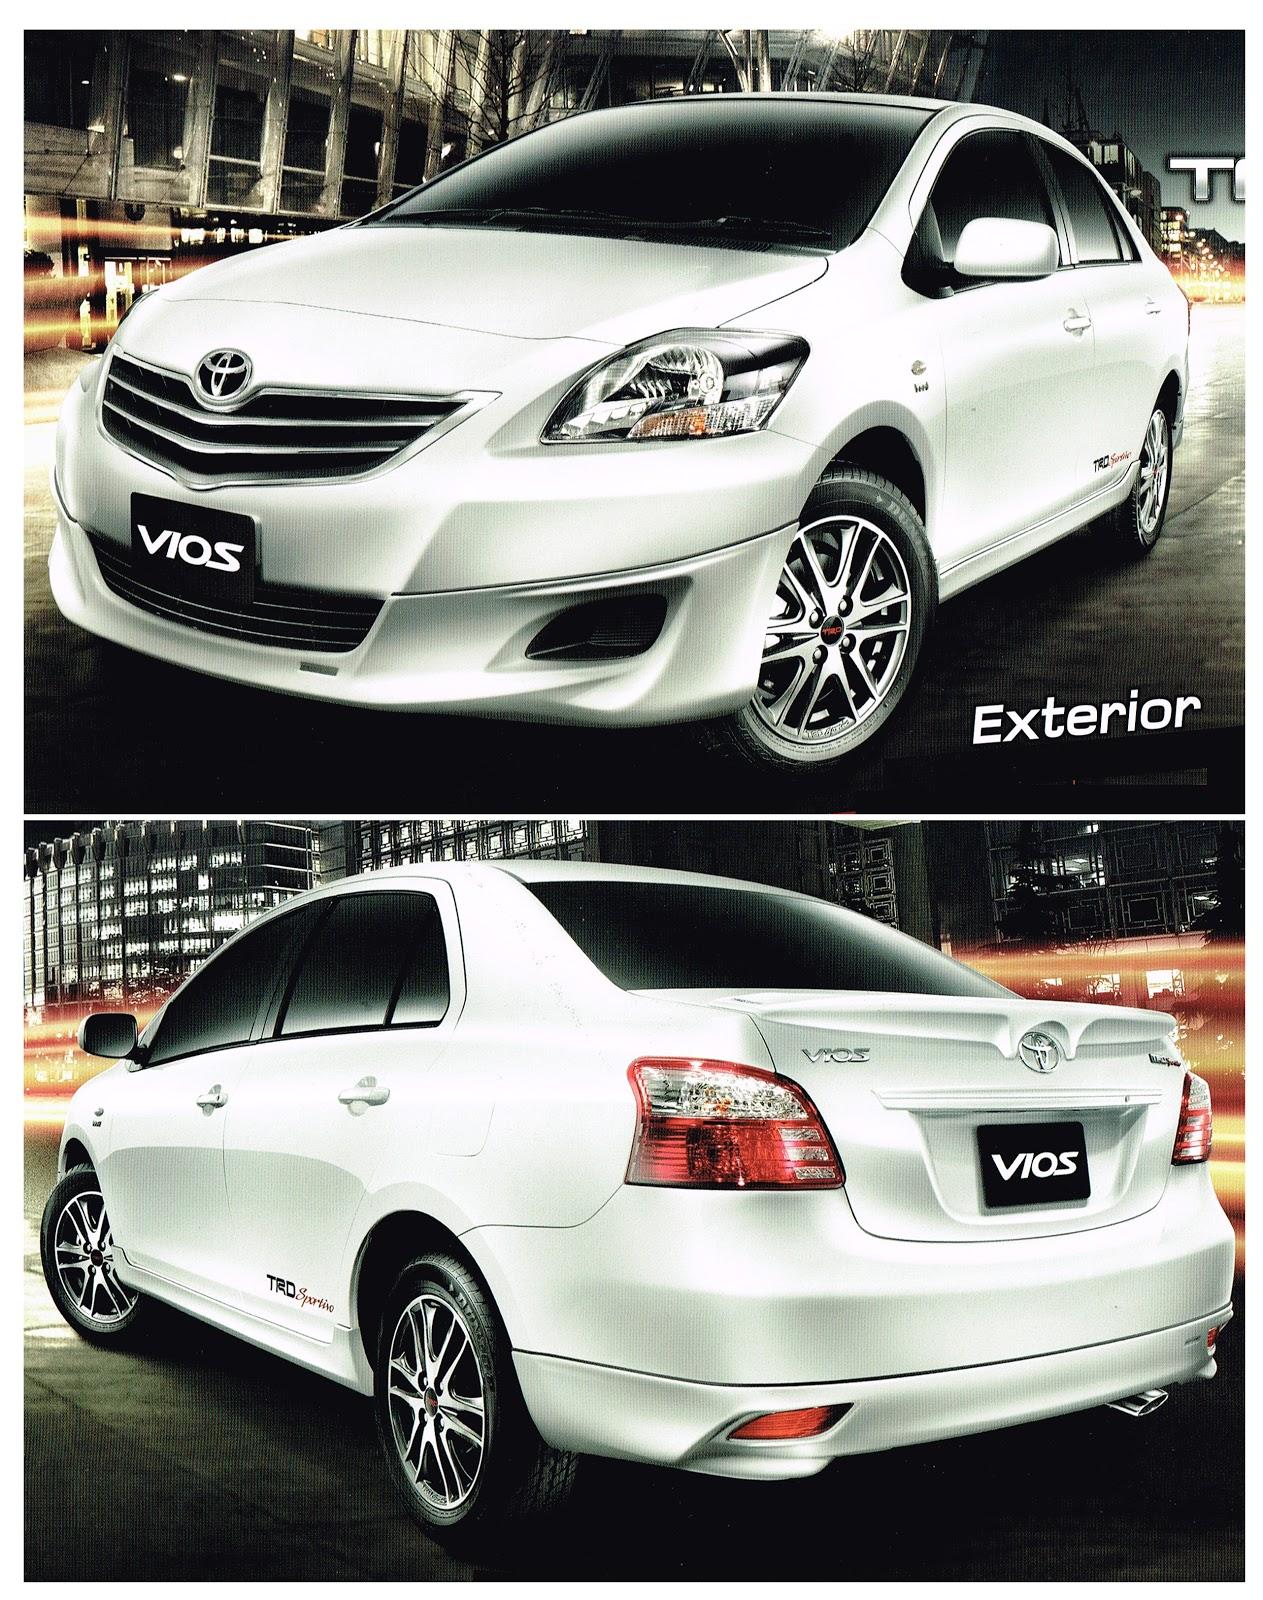 New Yaris Trd Sportivo 2014 Ukuran Wiper Grand Avanza 2015 Toyota Genuine Accessories Vios 2011